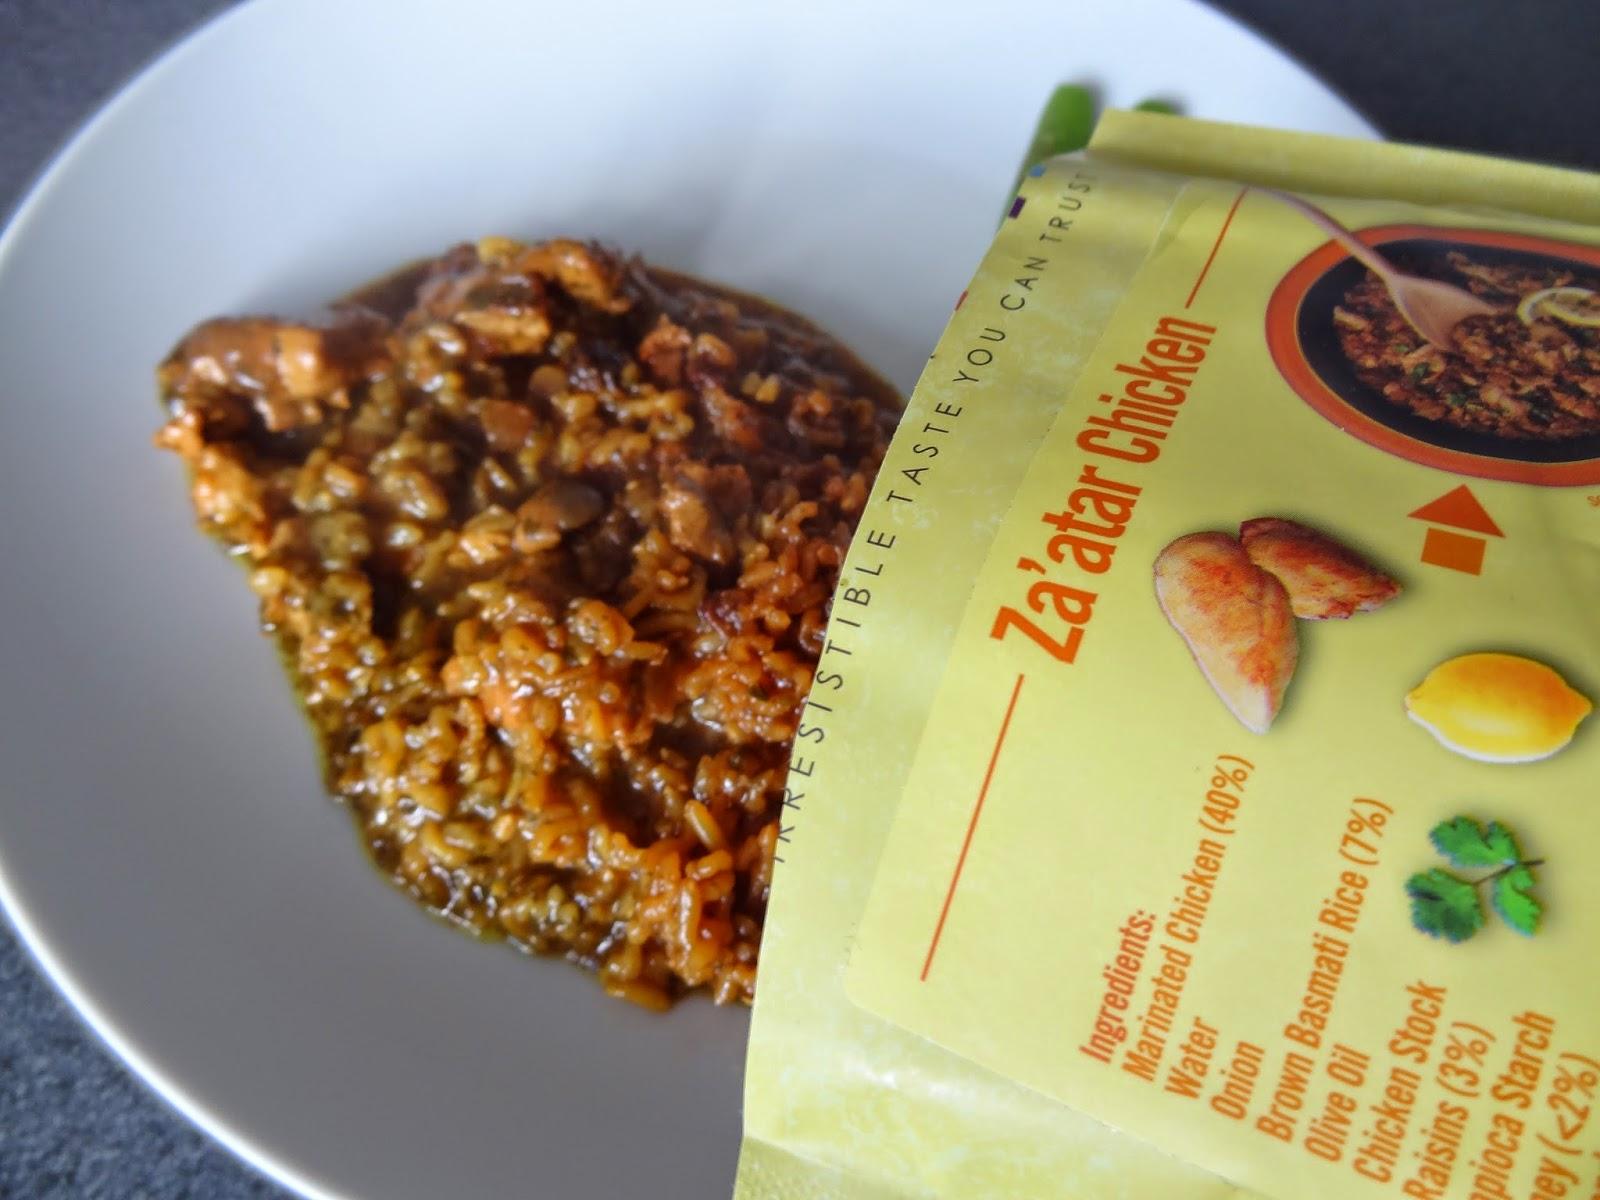 TBE_Ilumi_Za'atar+Chicken.JPG